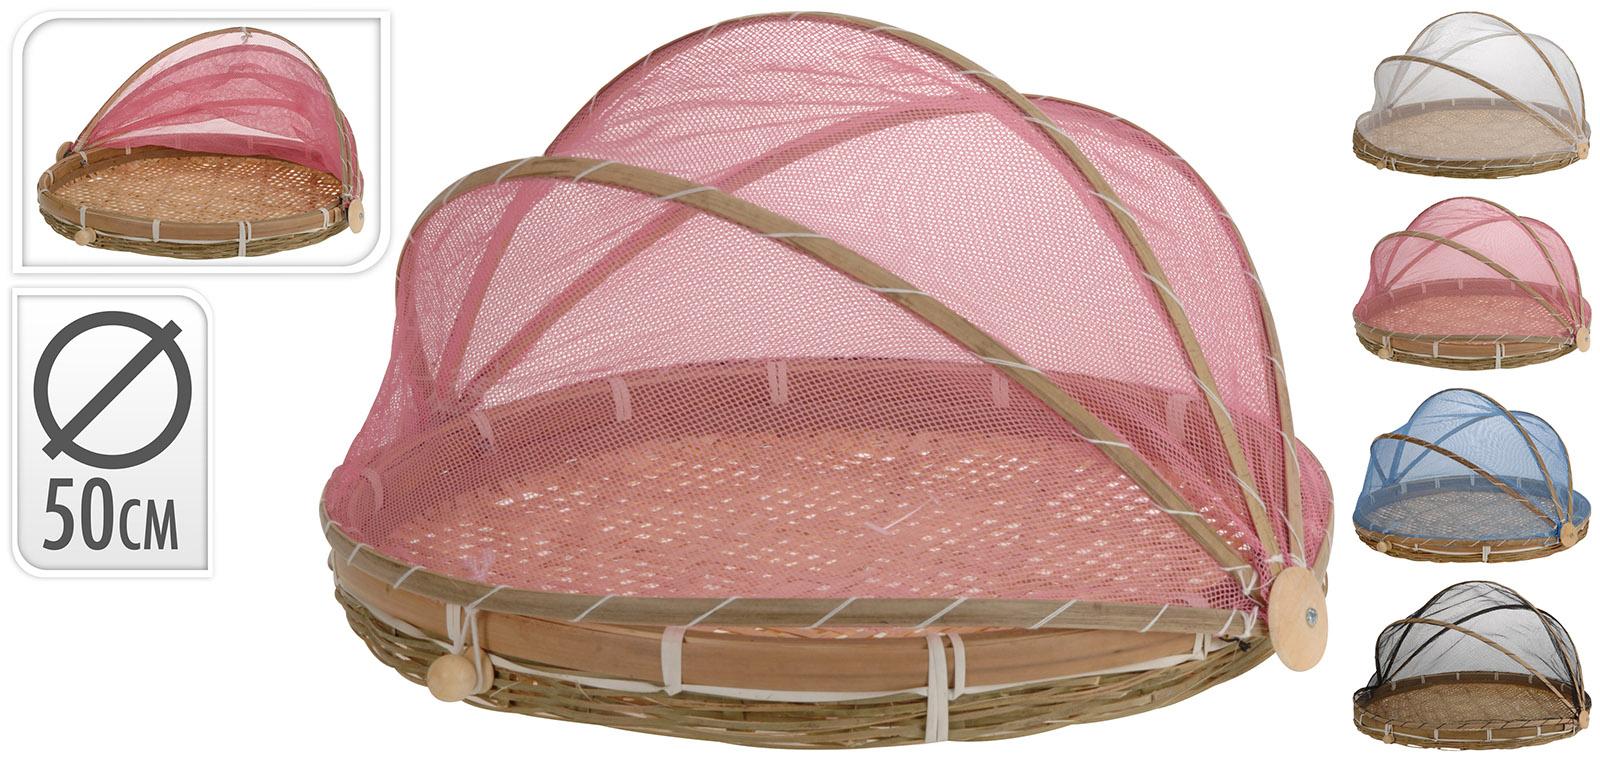 gro er obstkorb obstschale mit insektenschutz bambus korb. Black Bedroom Furniture Sets. Home Design Ideas